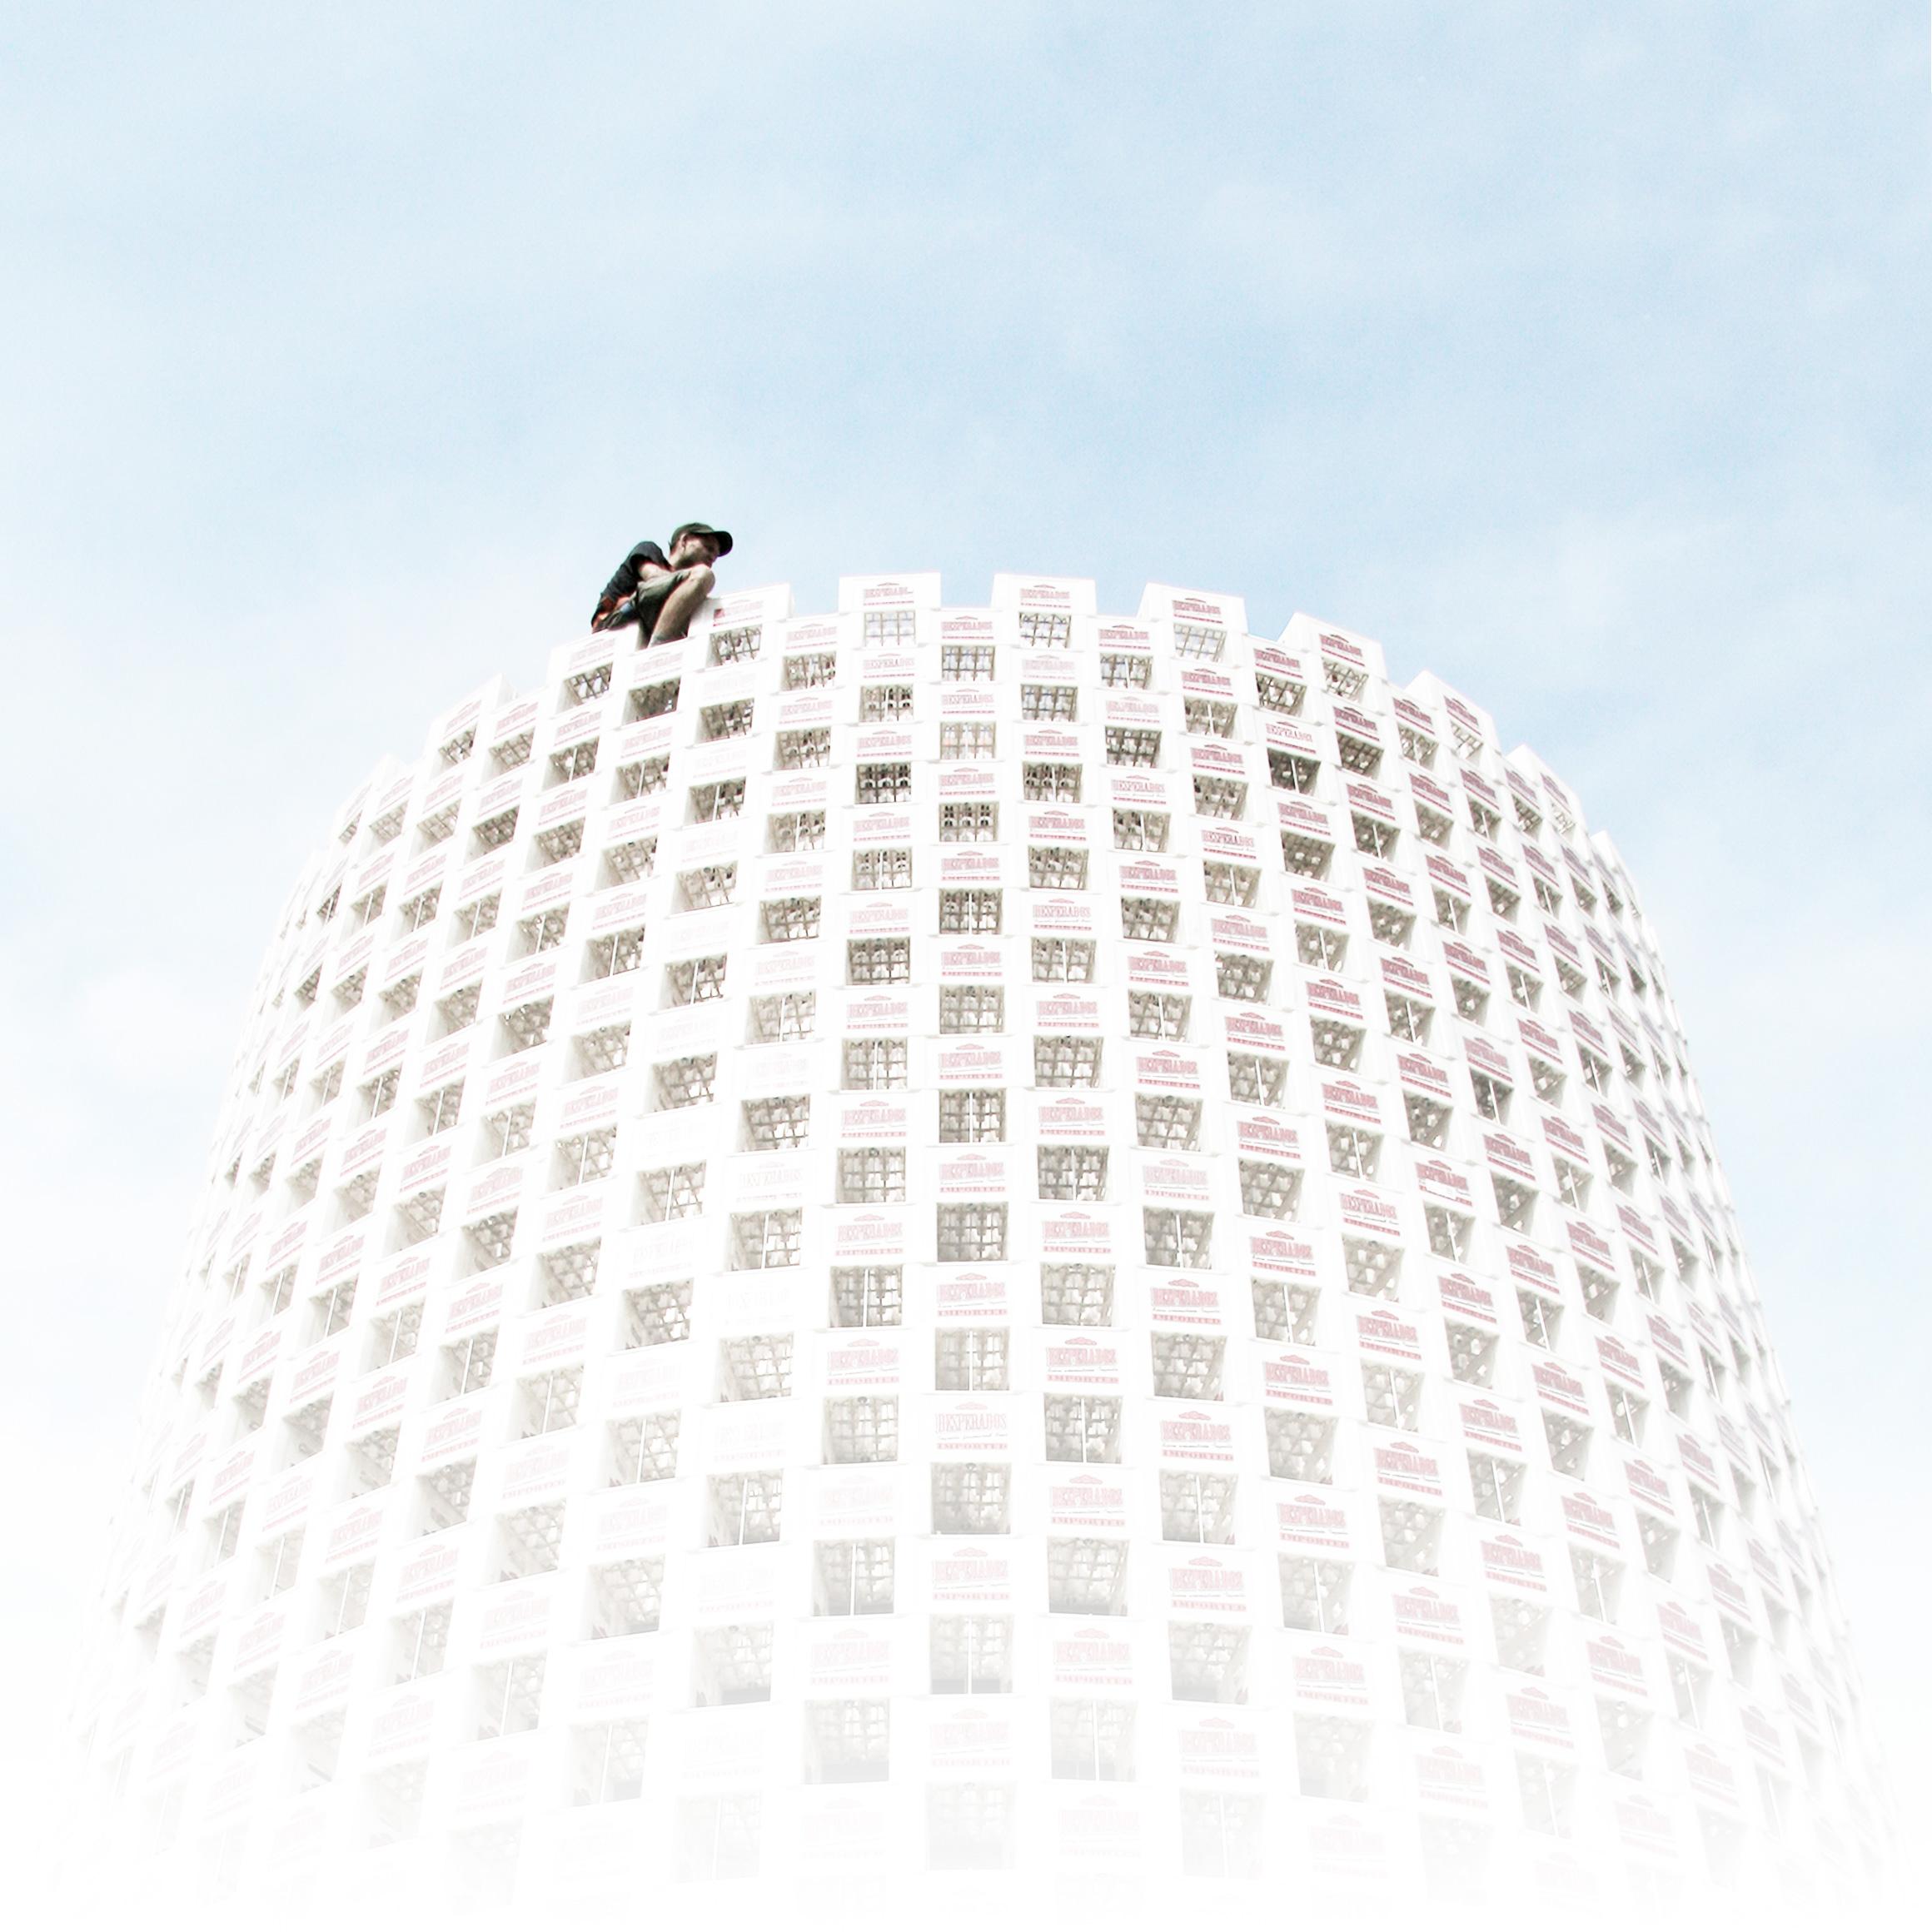 Mann auf Turm